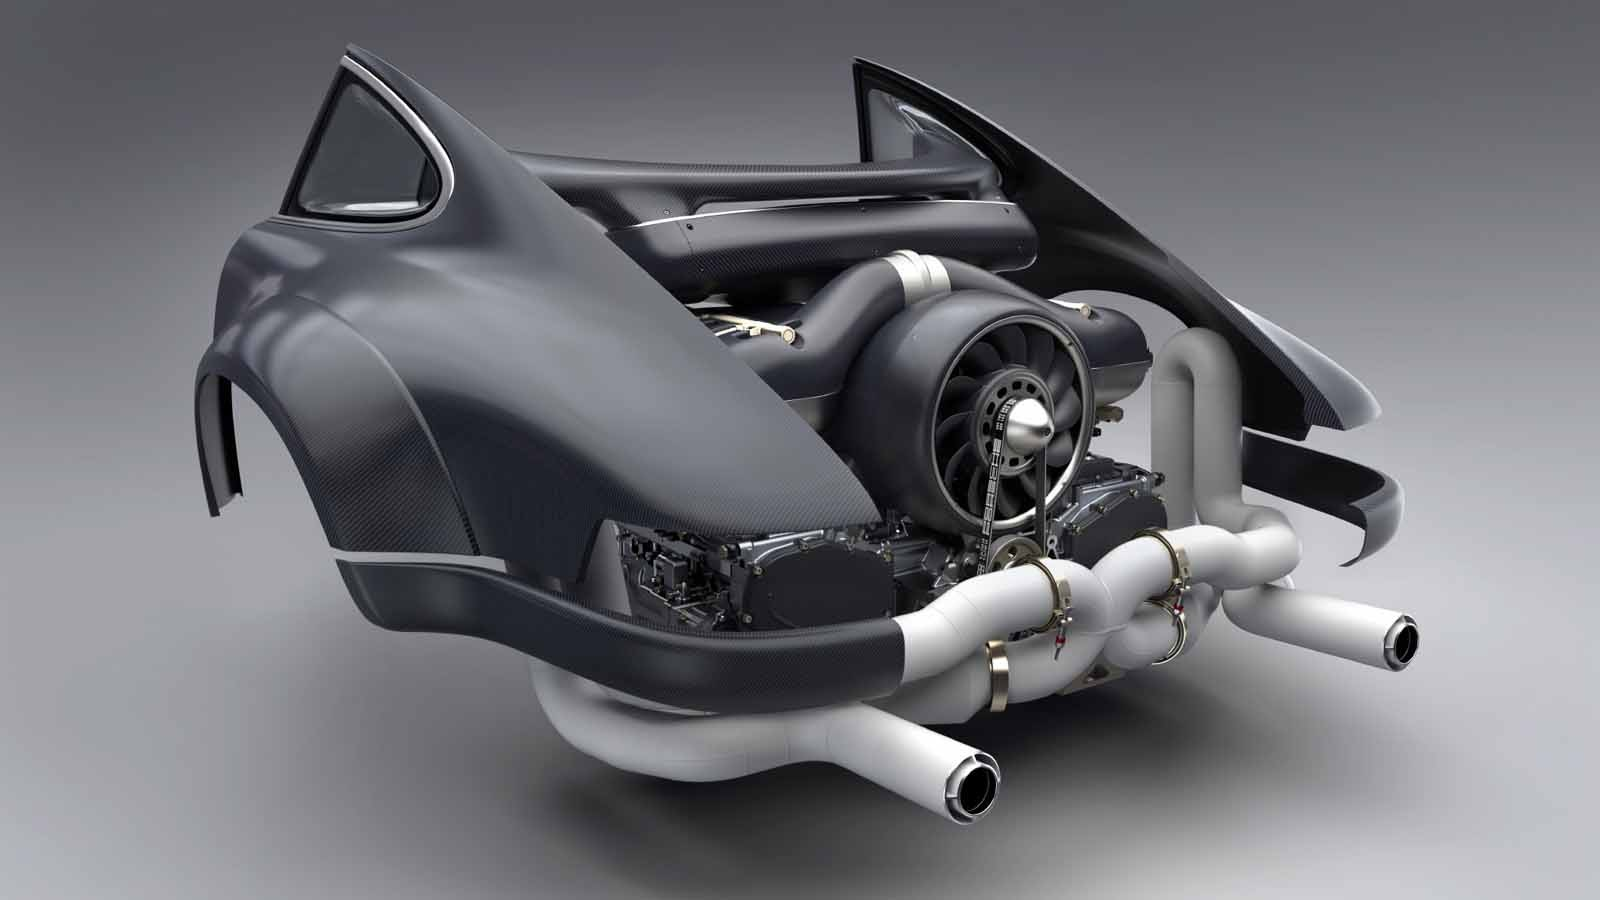 singer 39 s new 500 hp air cooled 911 engine sounds amazing. Black Bedroom Furniture Sets. Home Design Ideas